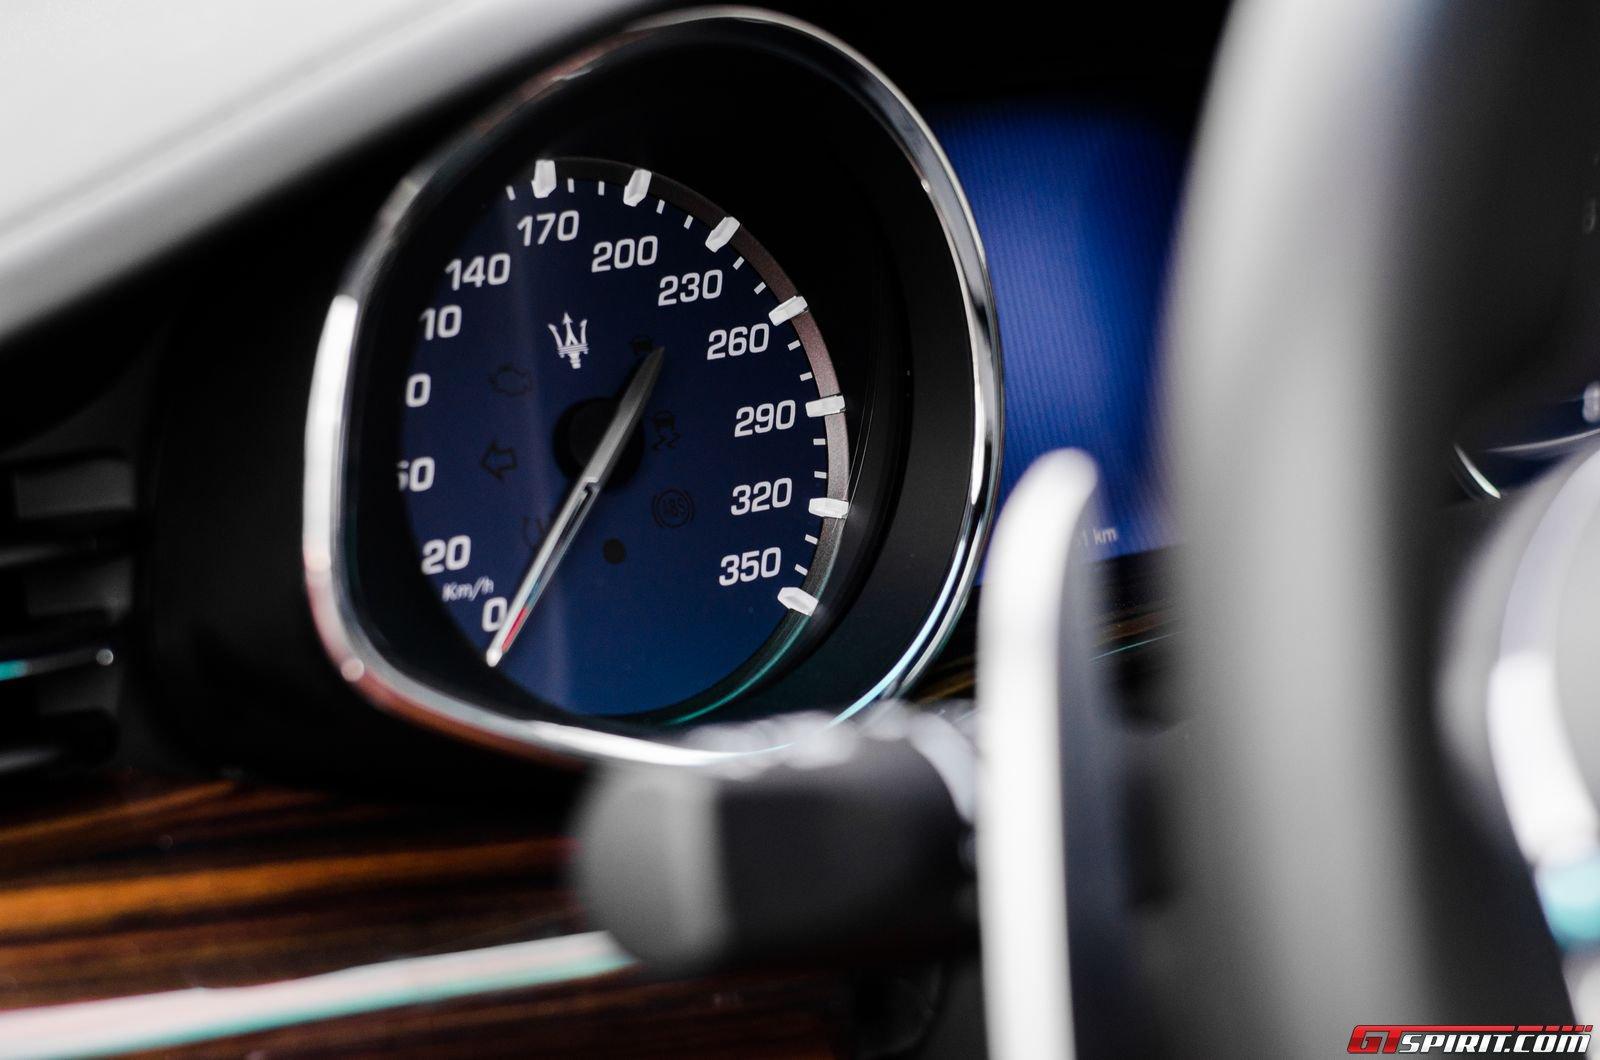 2014 Maserati Quattroporte GTS Review - GTspirit